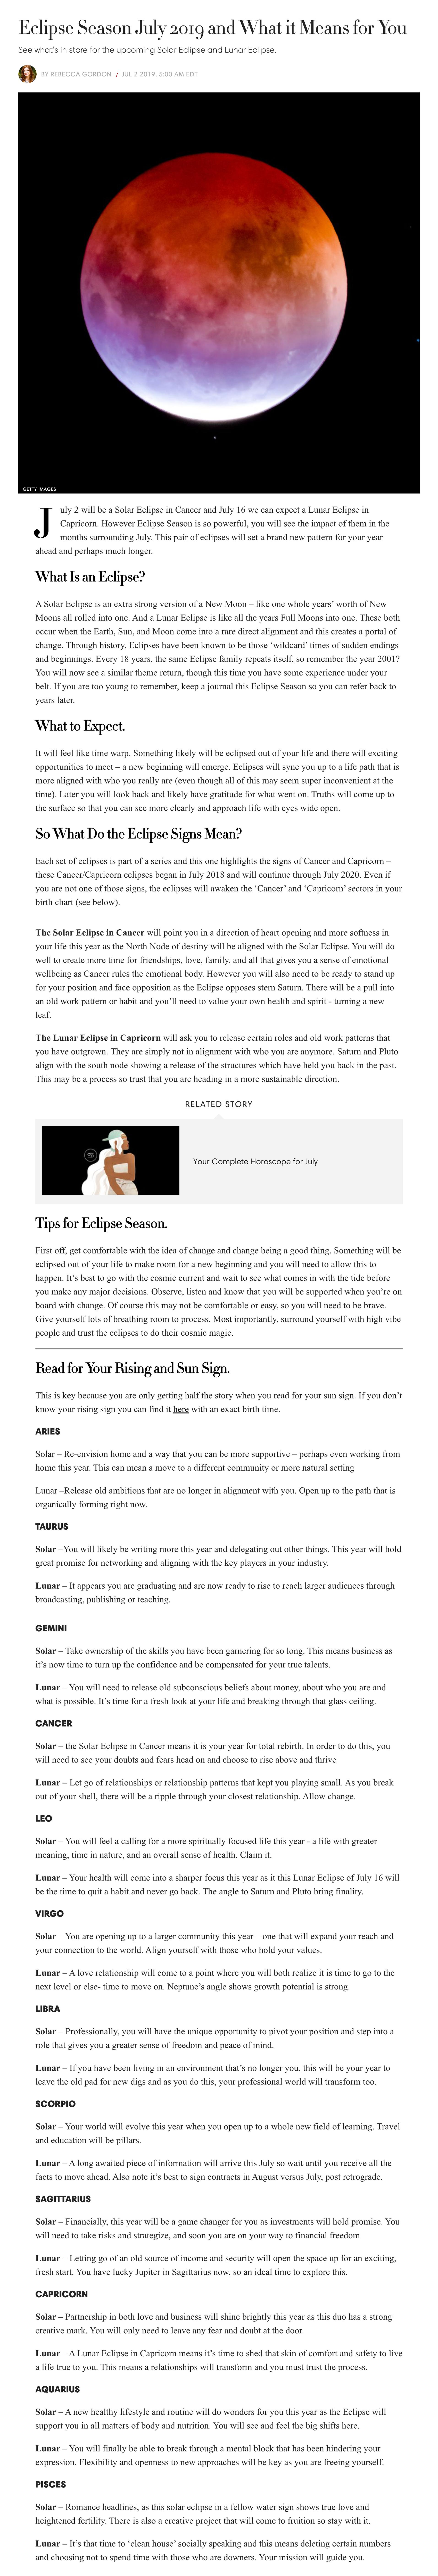 screencapture-harpersbazaar-horoscopes-a28253299-eclipse-july-2019-astrology-2019-07-02-11_29_26.png